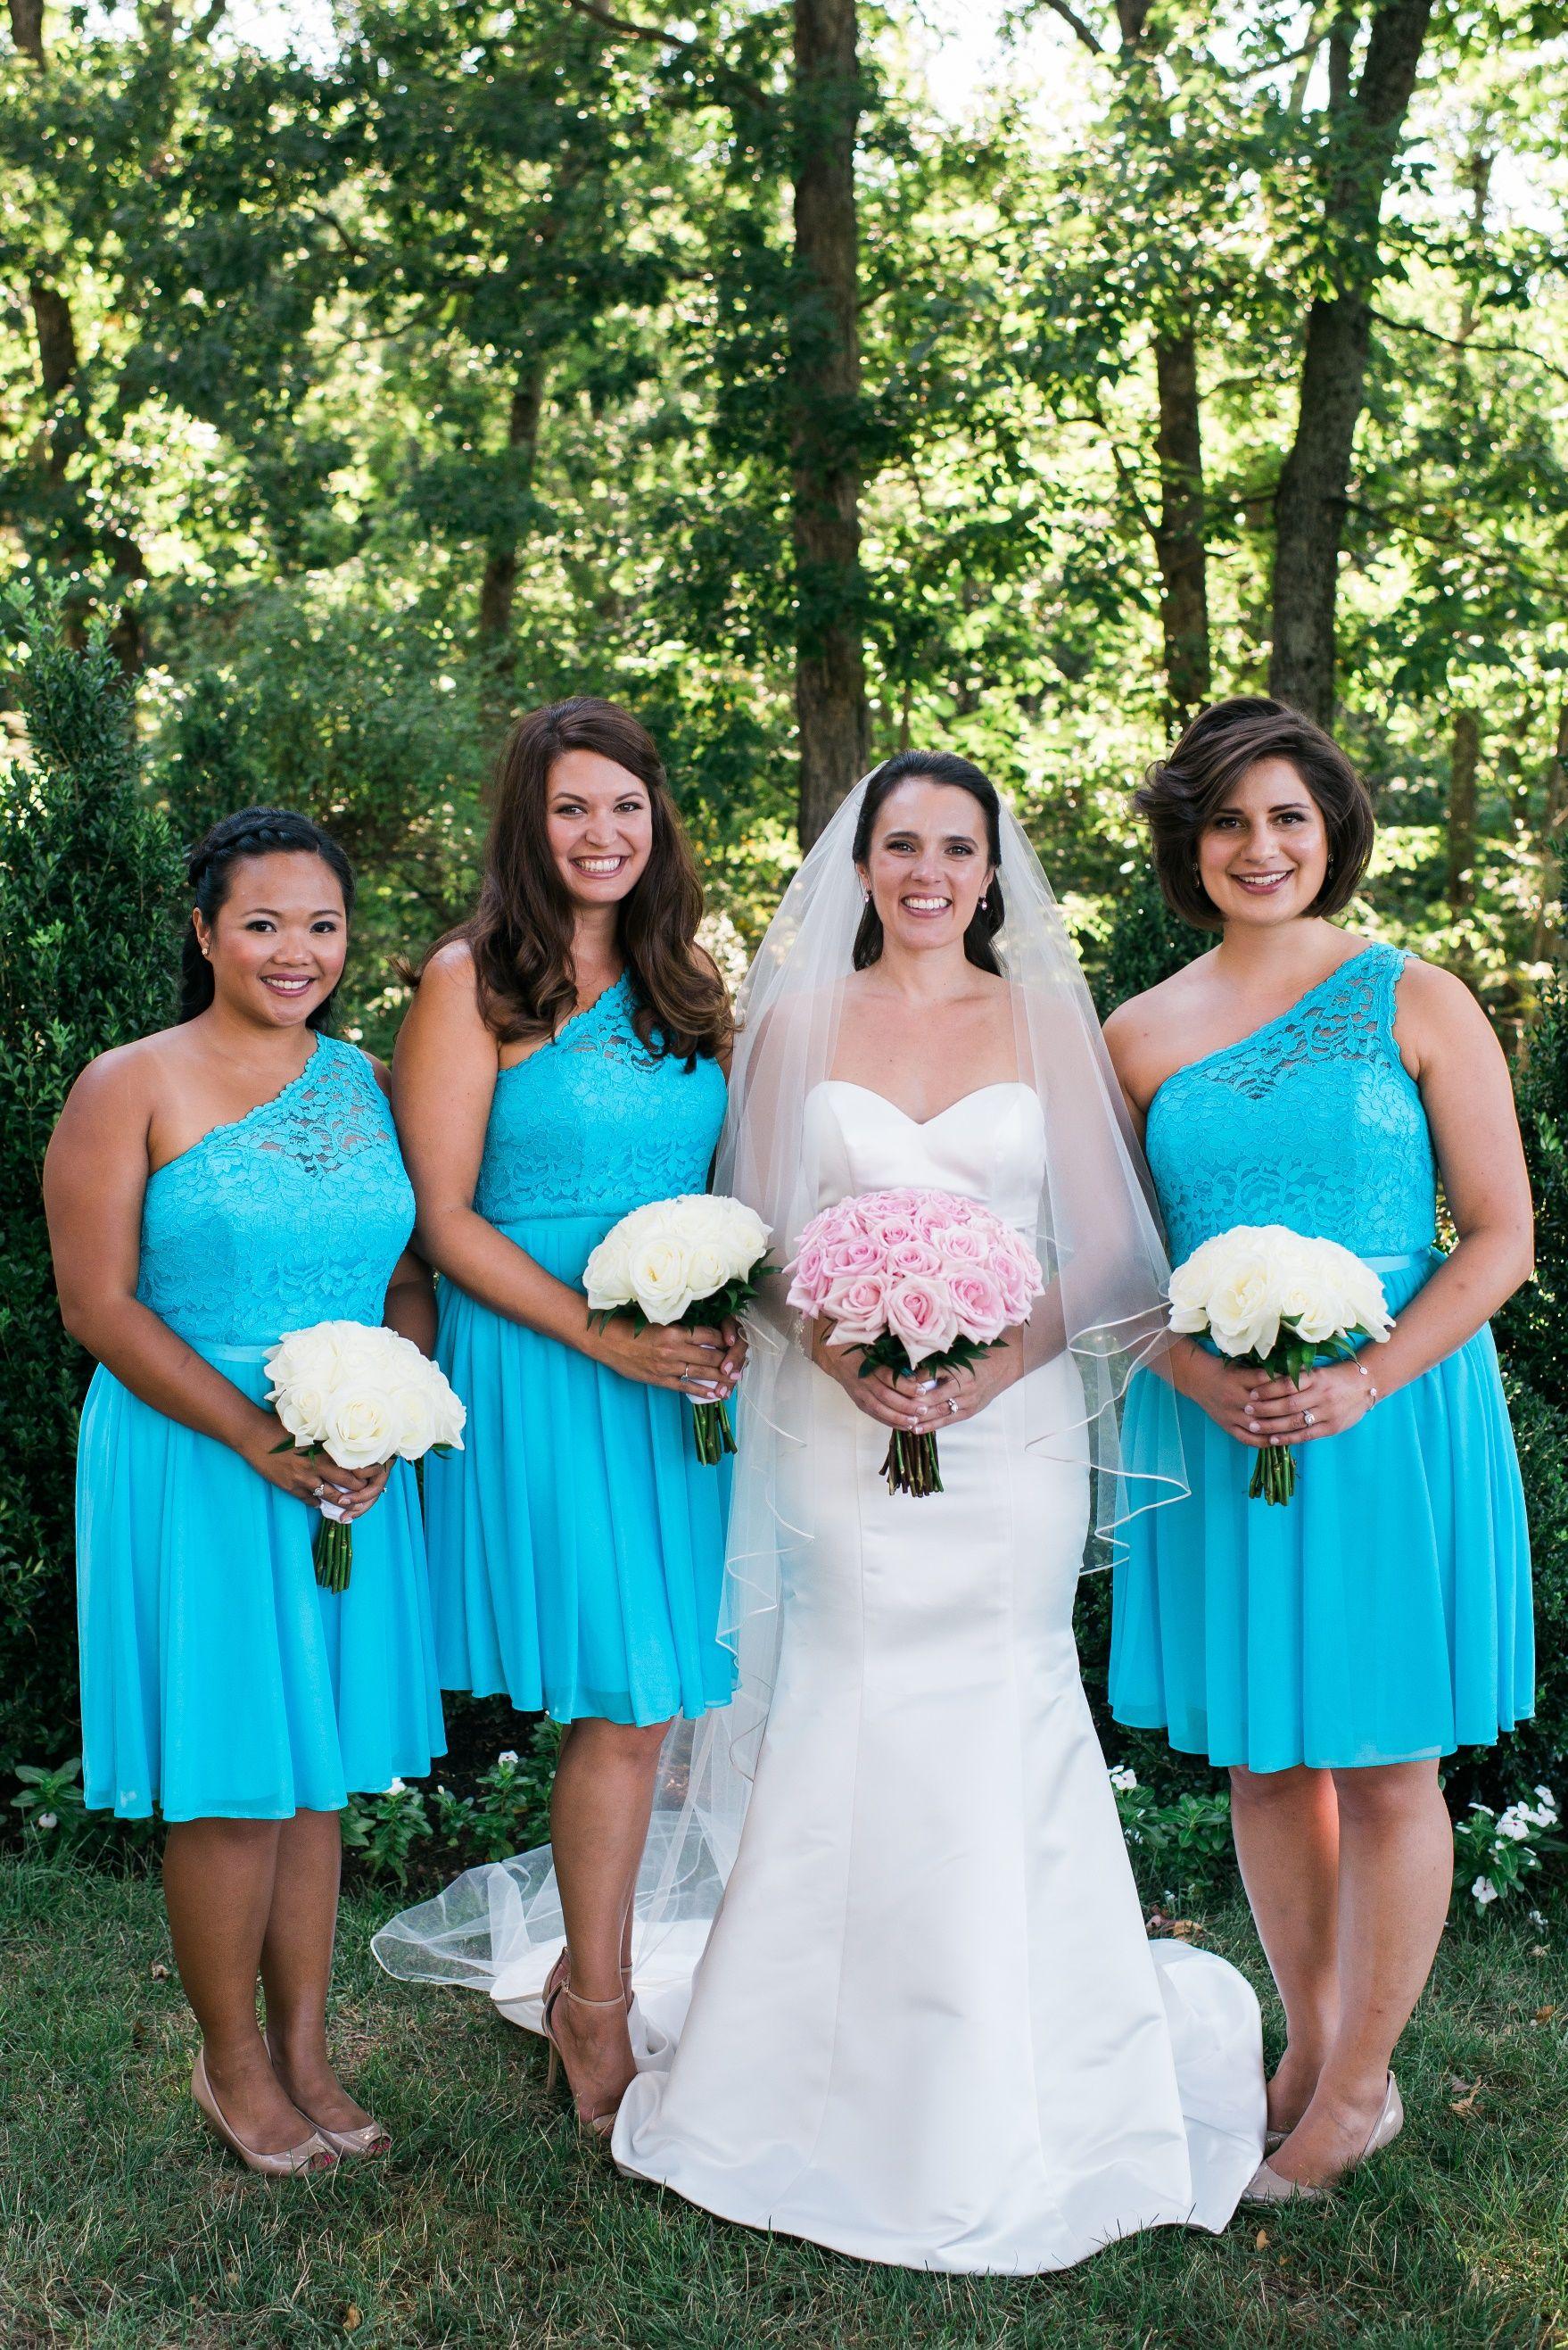 Malibu Teal Blue Bridesmaid Dresses With One Shoulder Spring